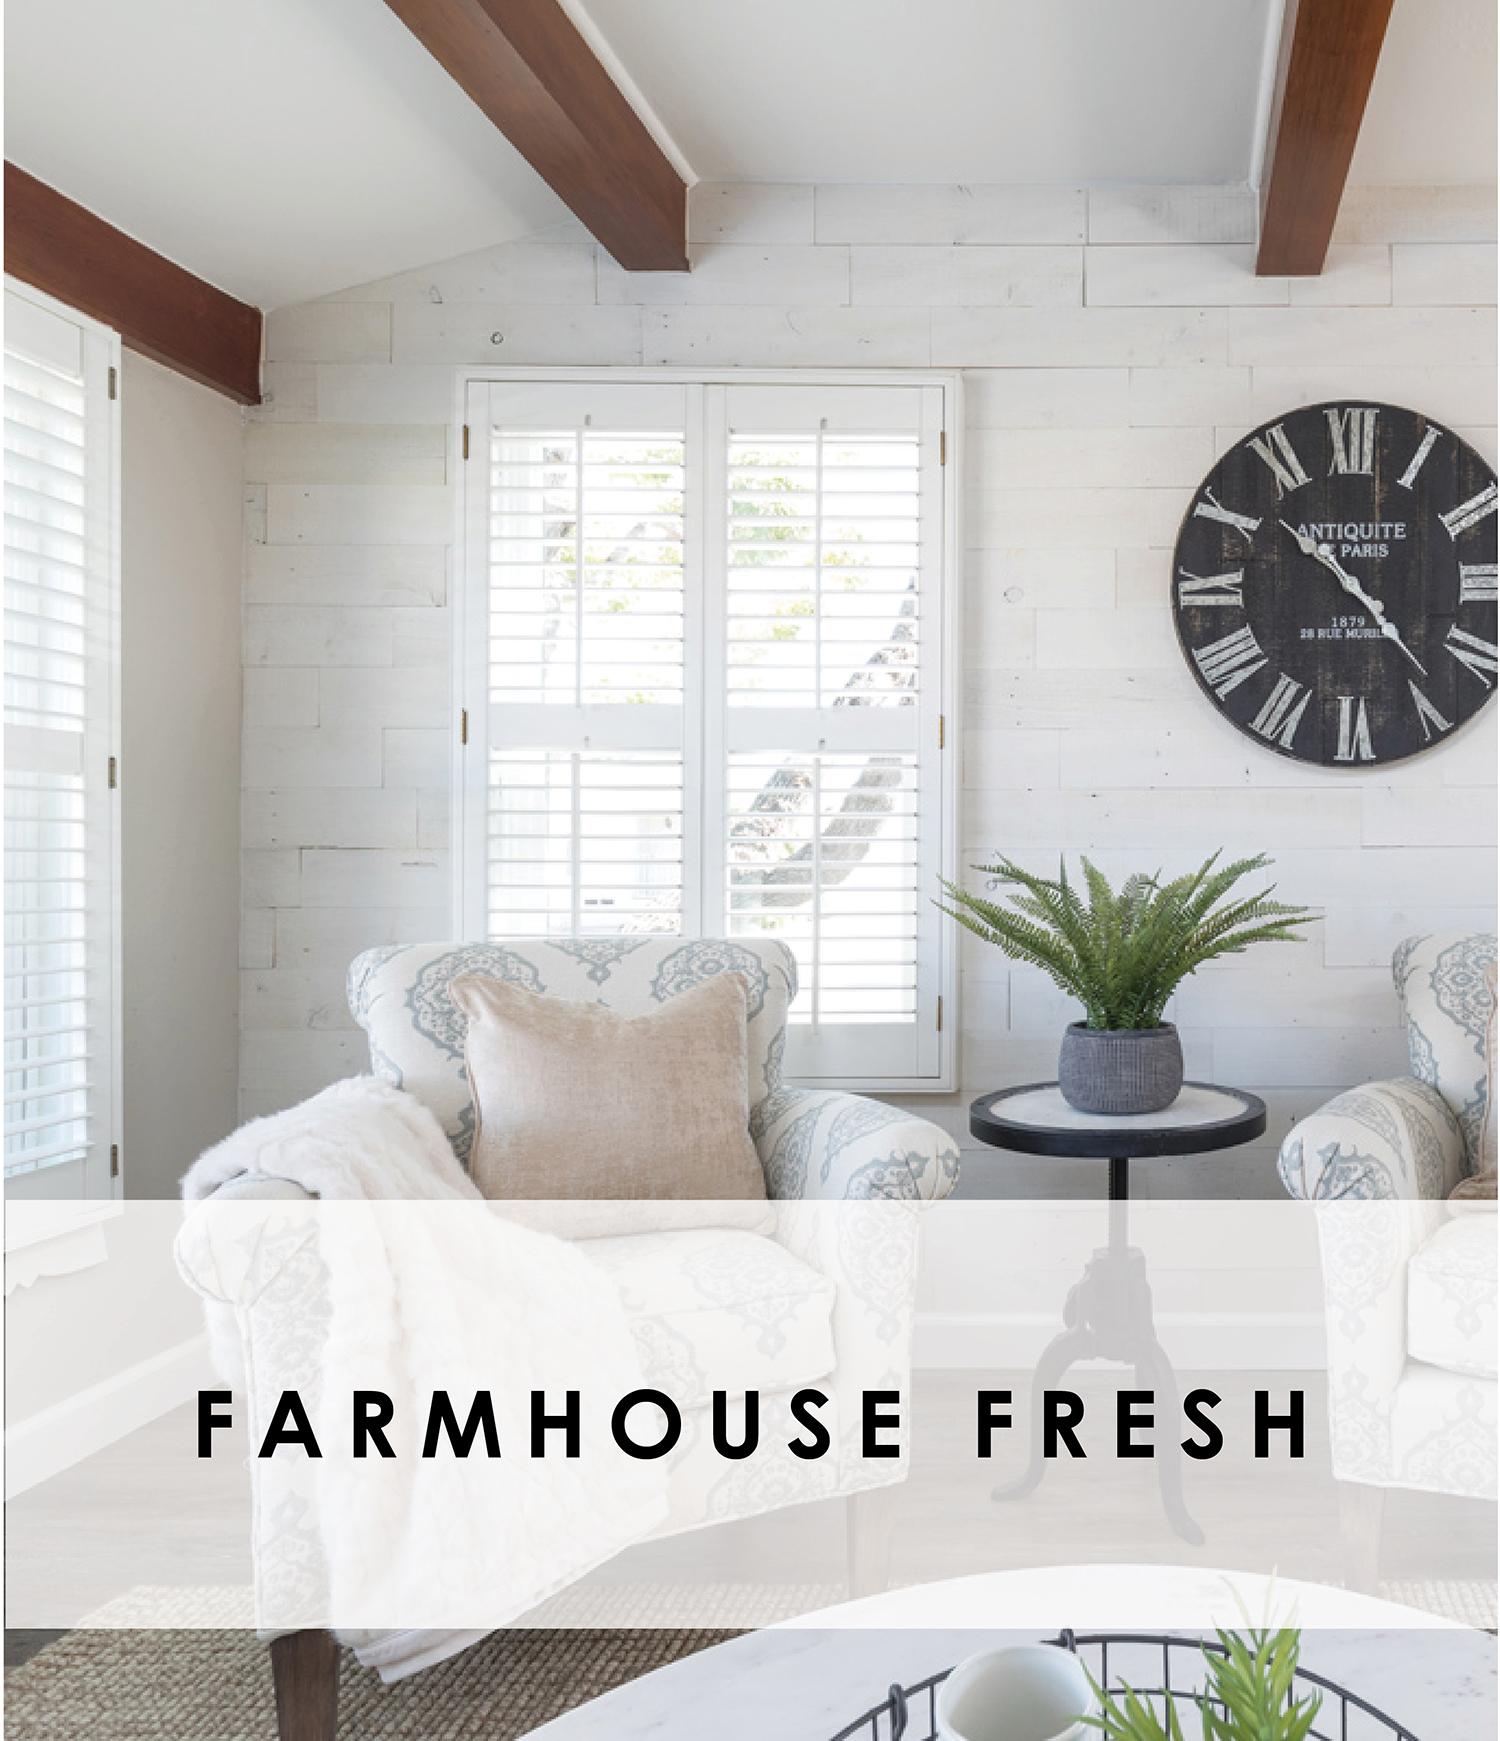 Farmhouse Fresh_Jessup.jpg